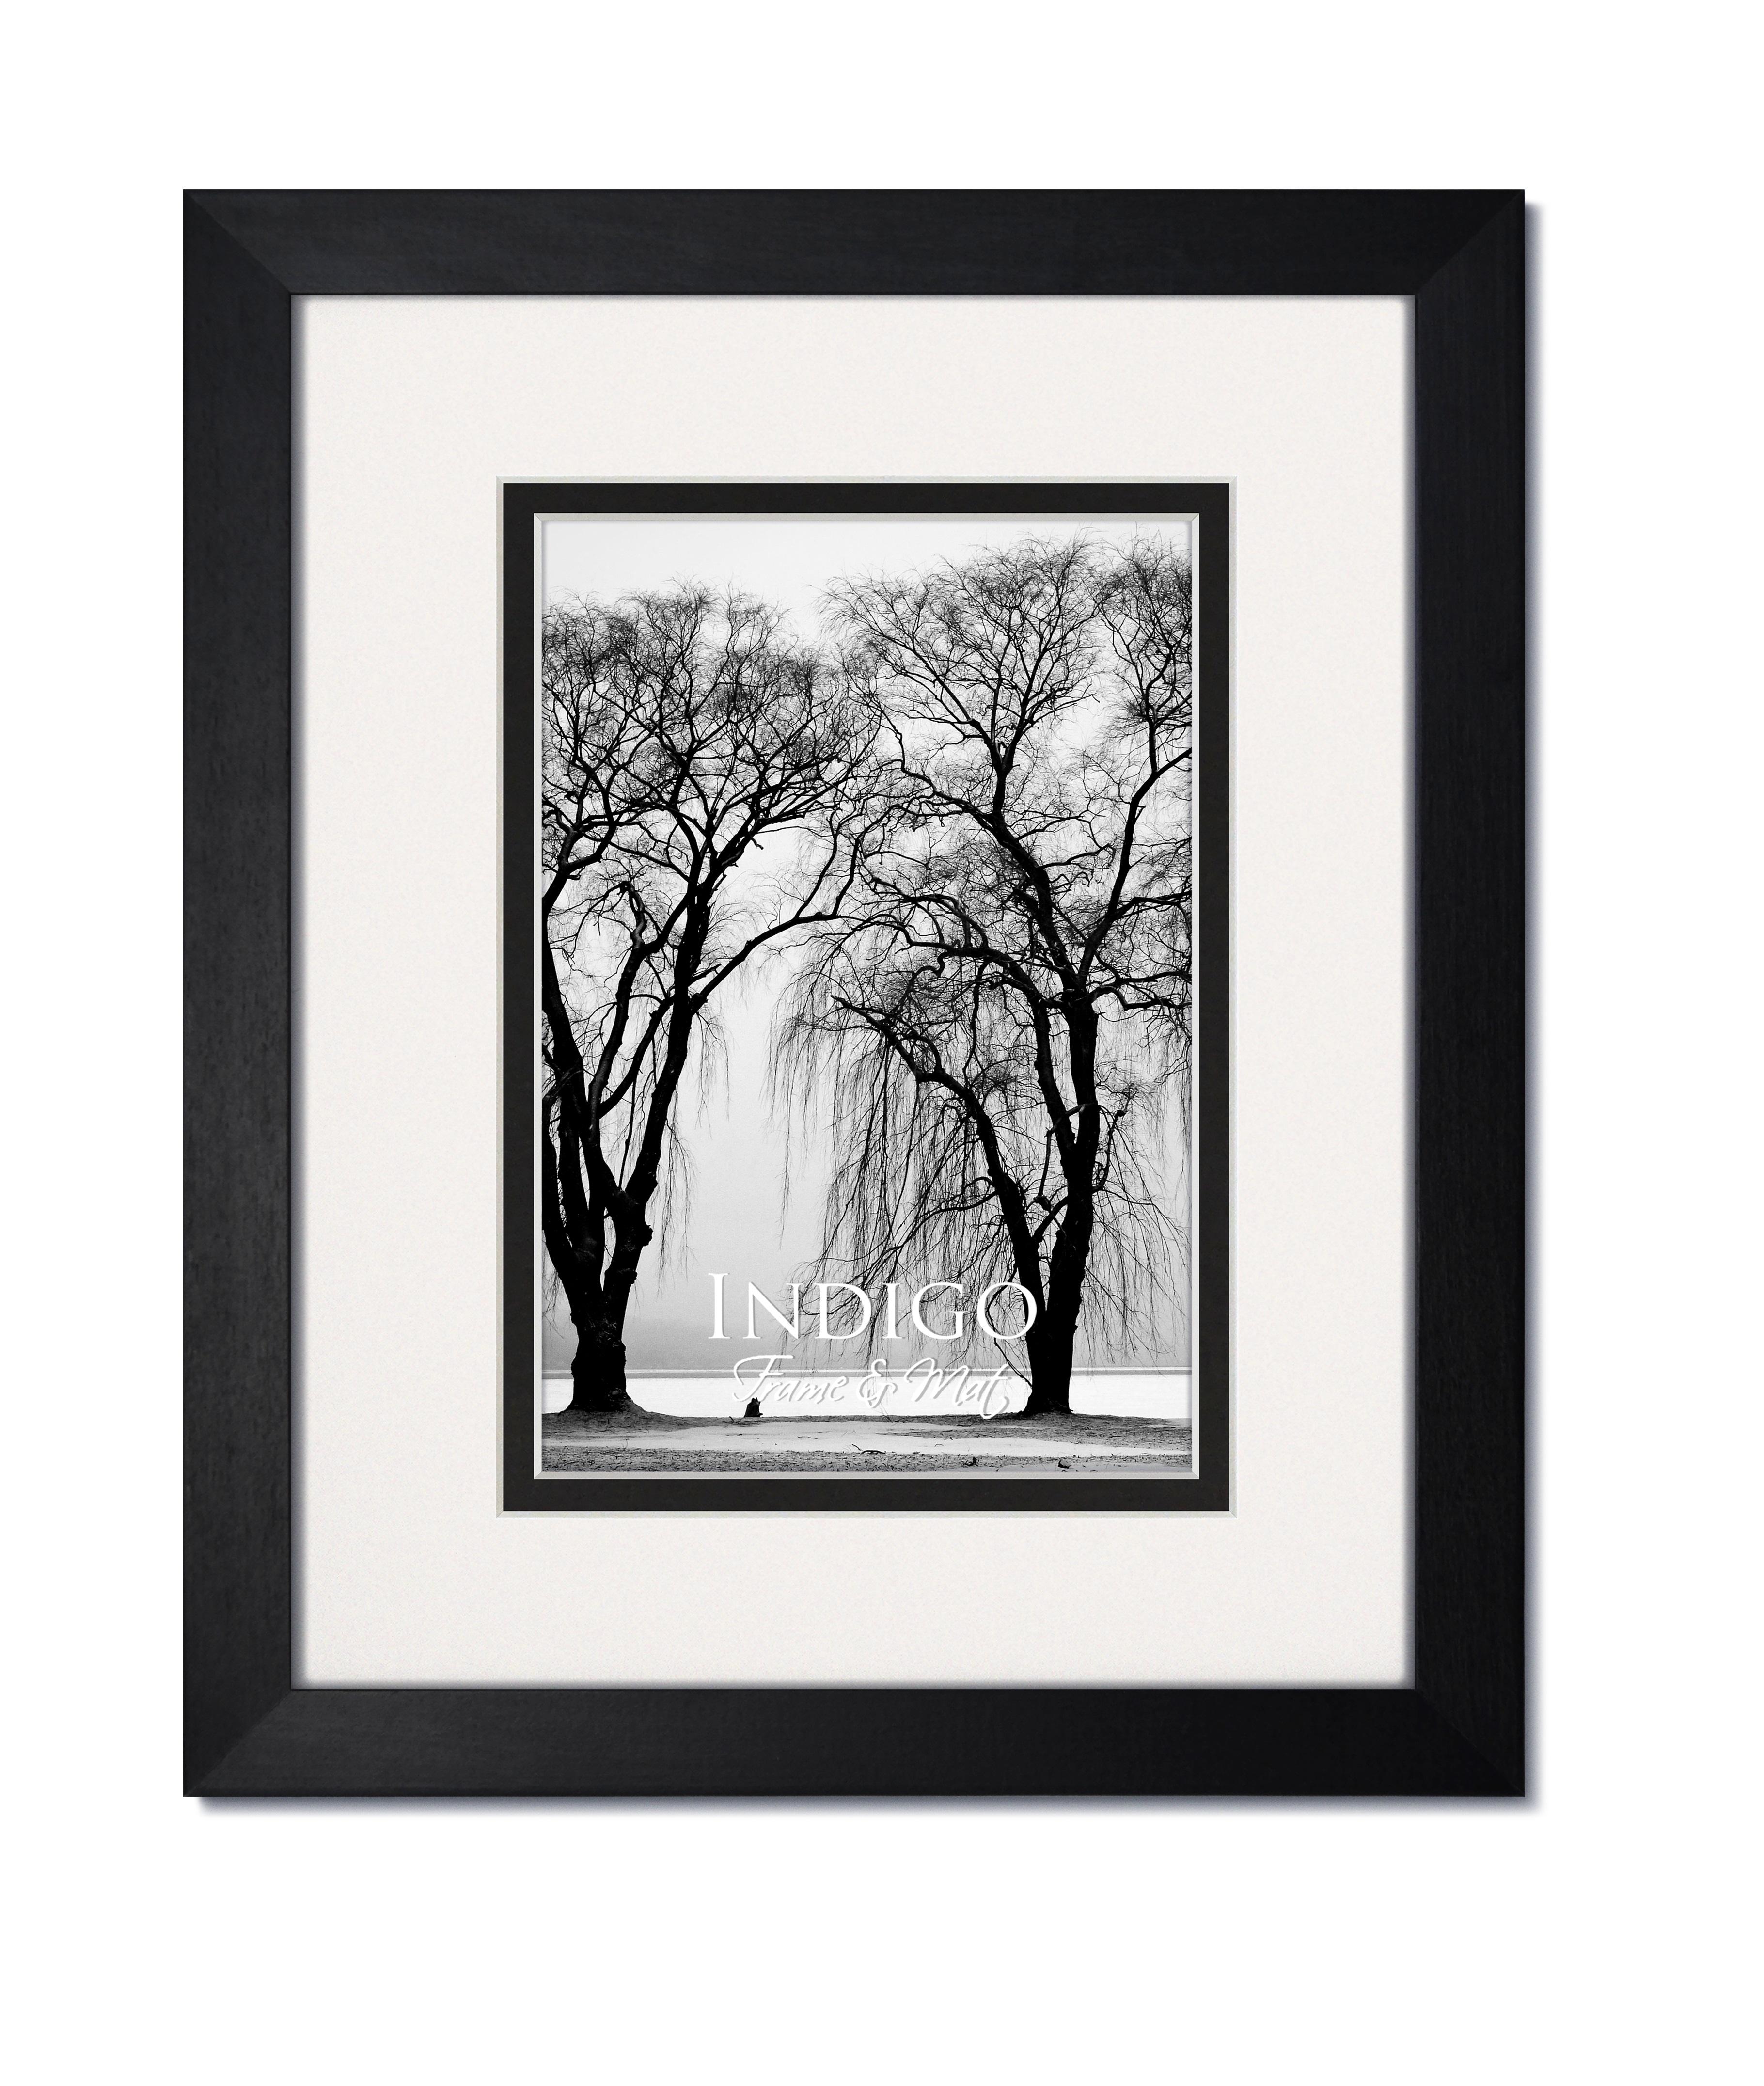 Gallery Ii Black Hardwood Frame With White Over Black Mat